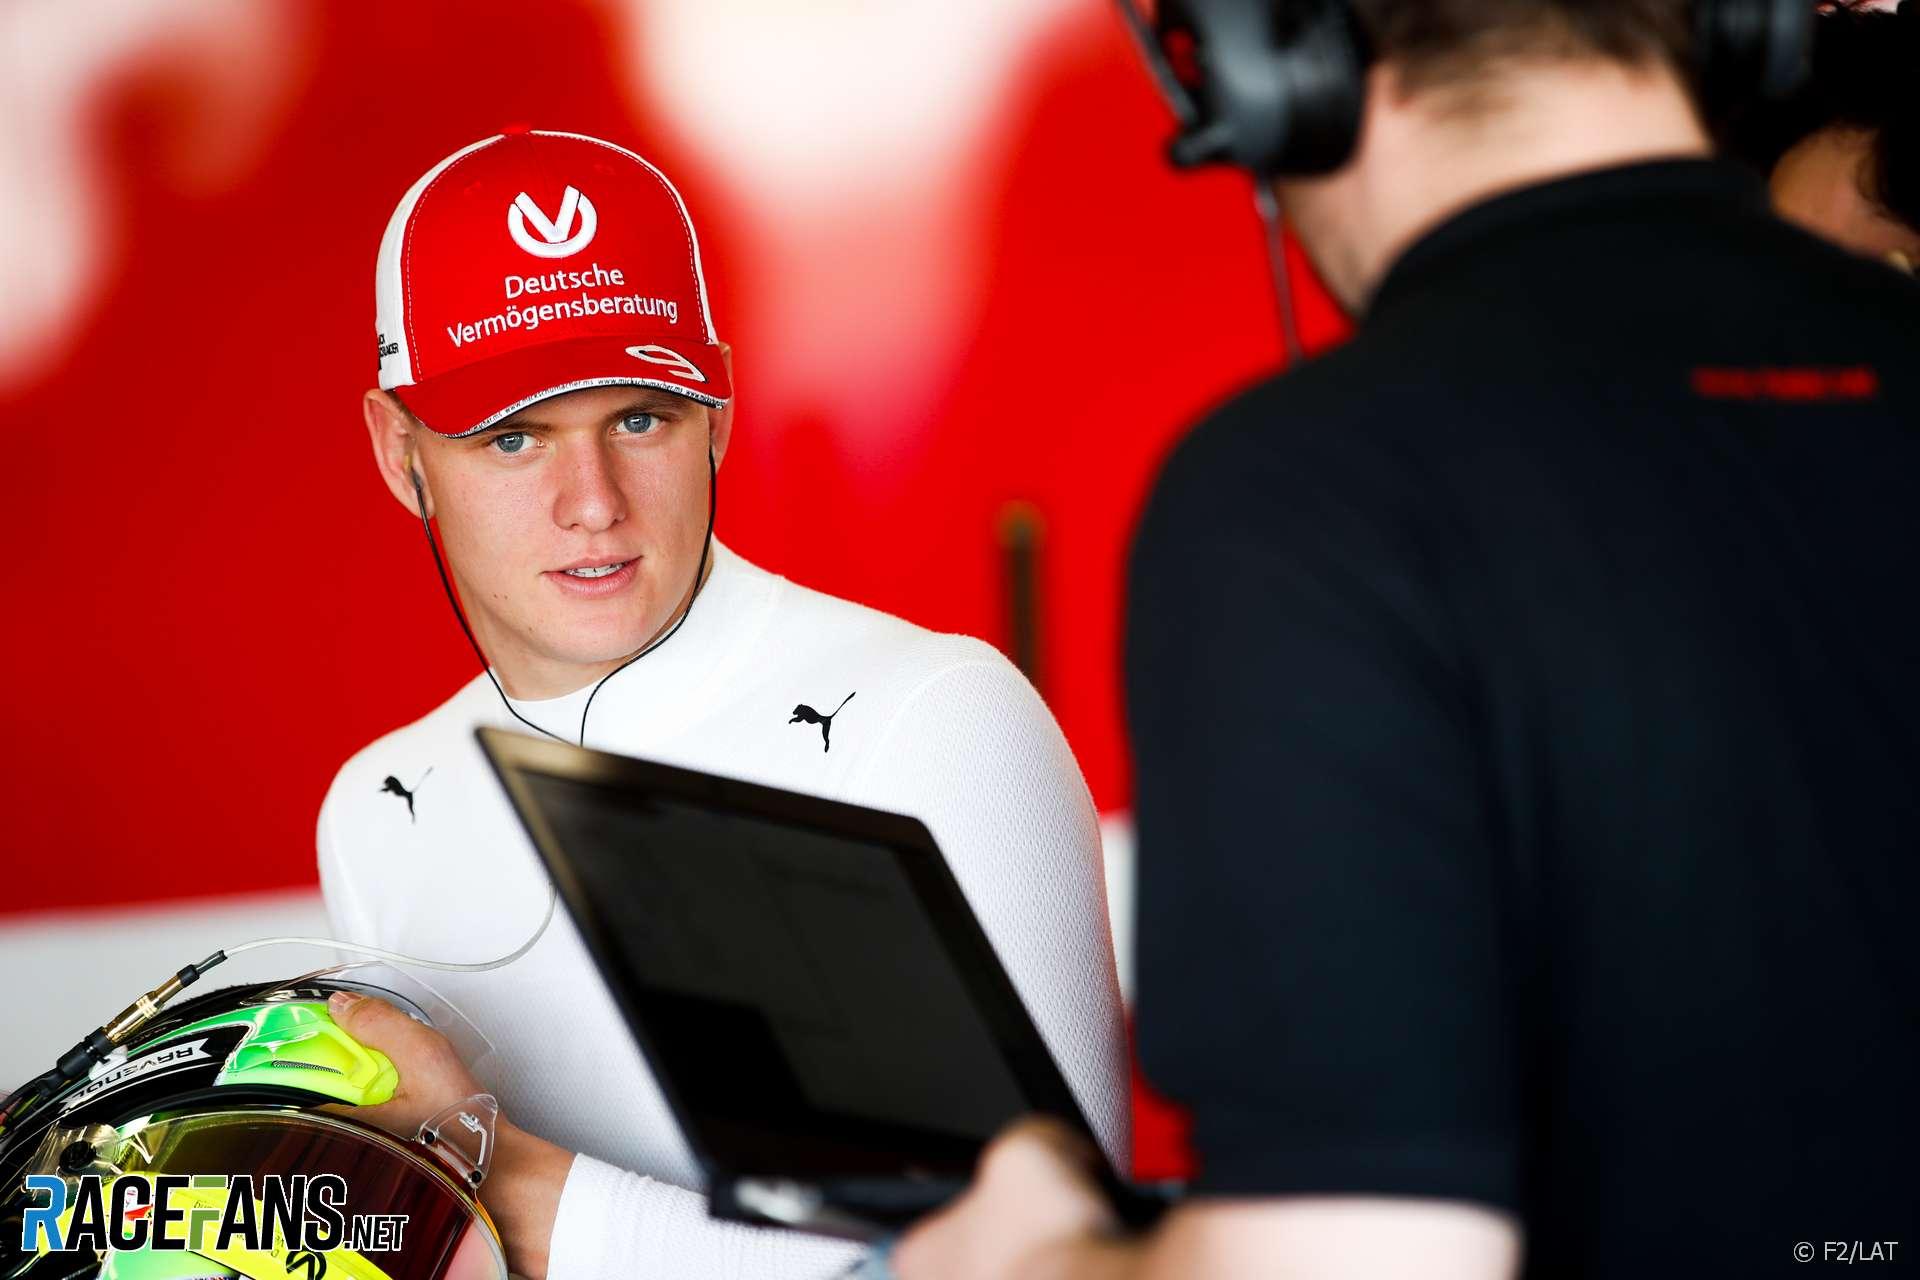 Mick Schumacher, Prema, Formula 2, 2019 · RaceFans